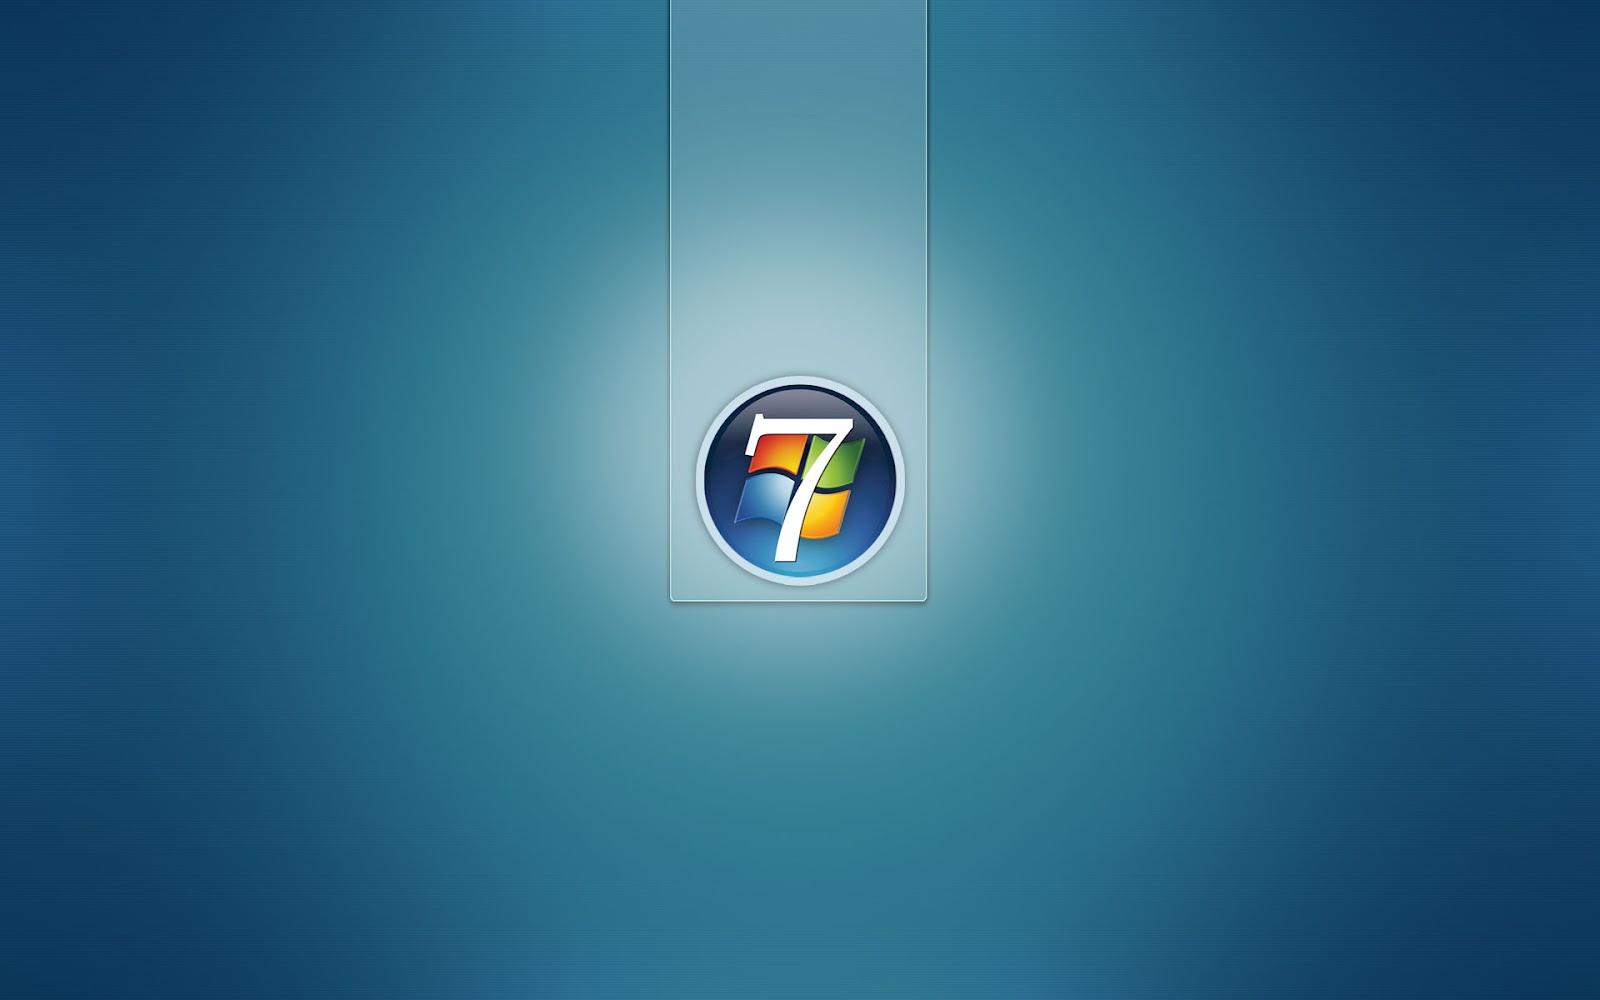 http://1.bp.blogspot.com/-T0w8rNo7qK8/T5CH1h1gORI/AAAAAAAABeY/HdFWl_lQgsc/s1600/Windows_Se7en_Wallpaper_Concept_by_JurgenDoe.jpg